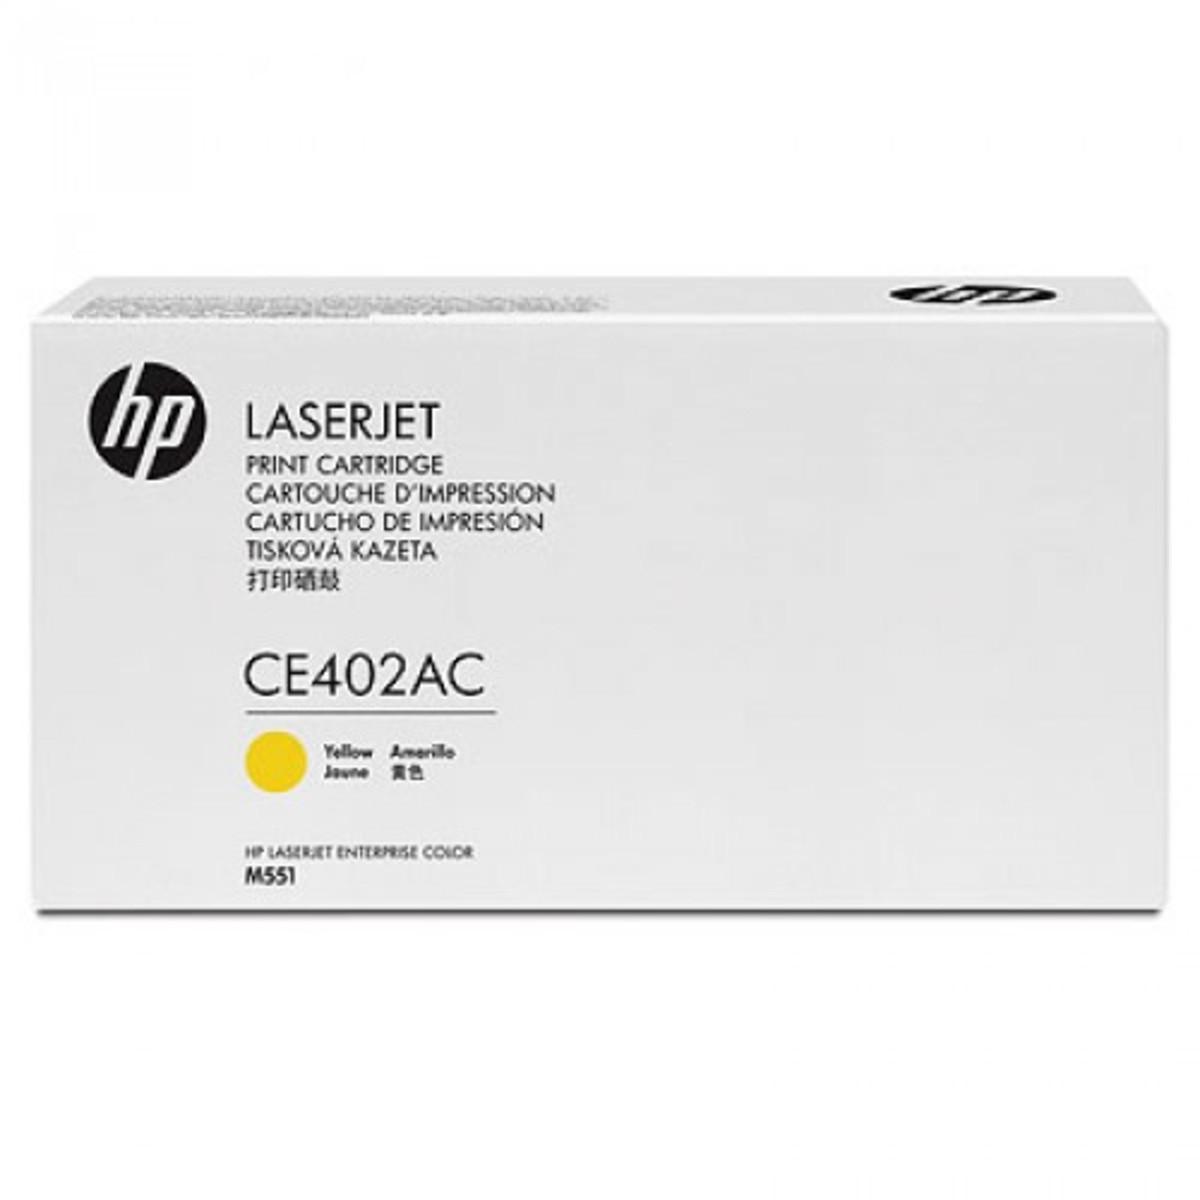 HP 507AC (CE402AC) Yellow Toner Cartridge - Contract Cartridge